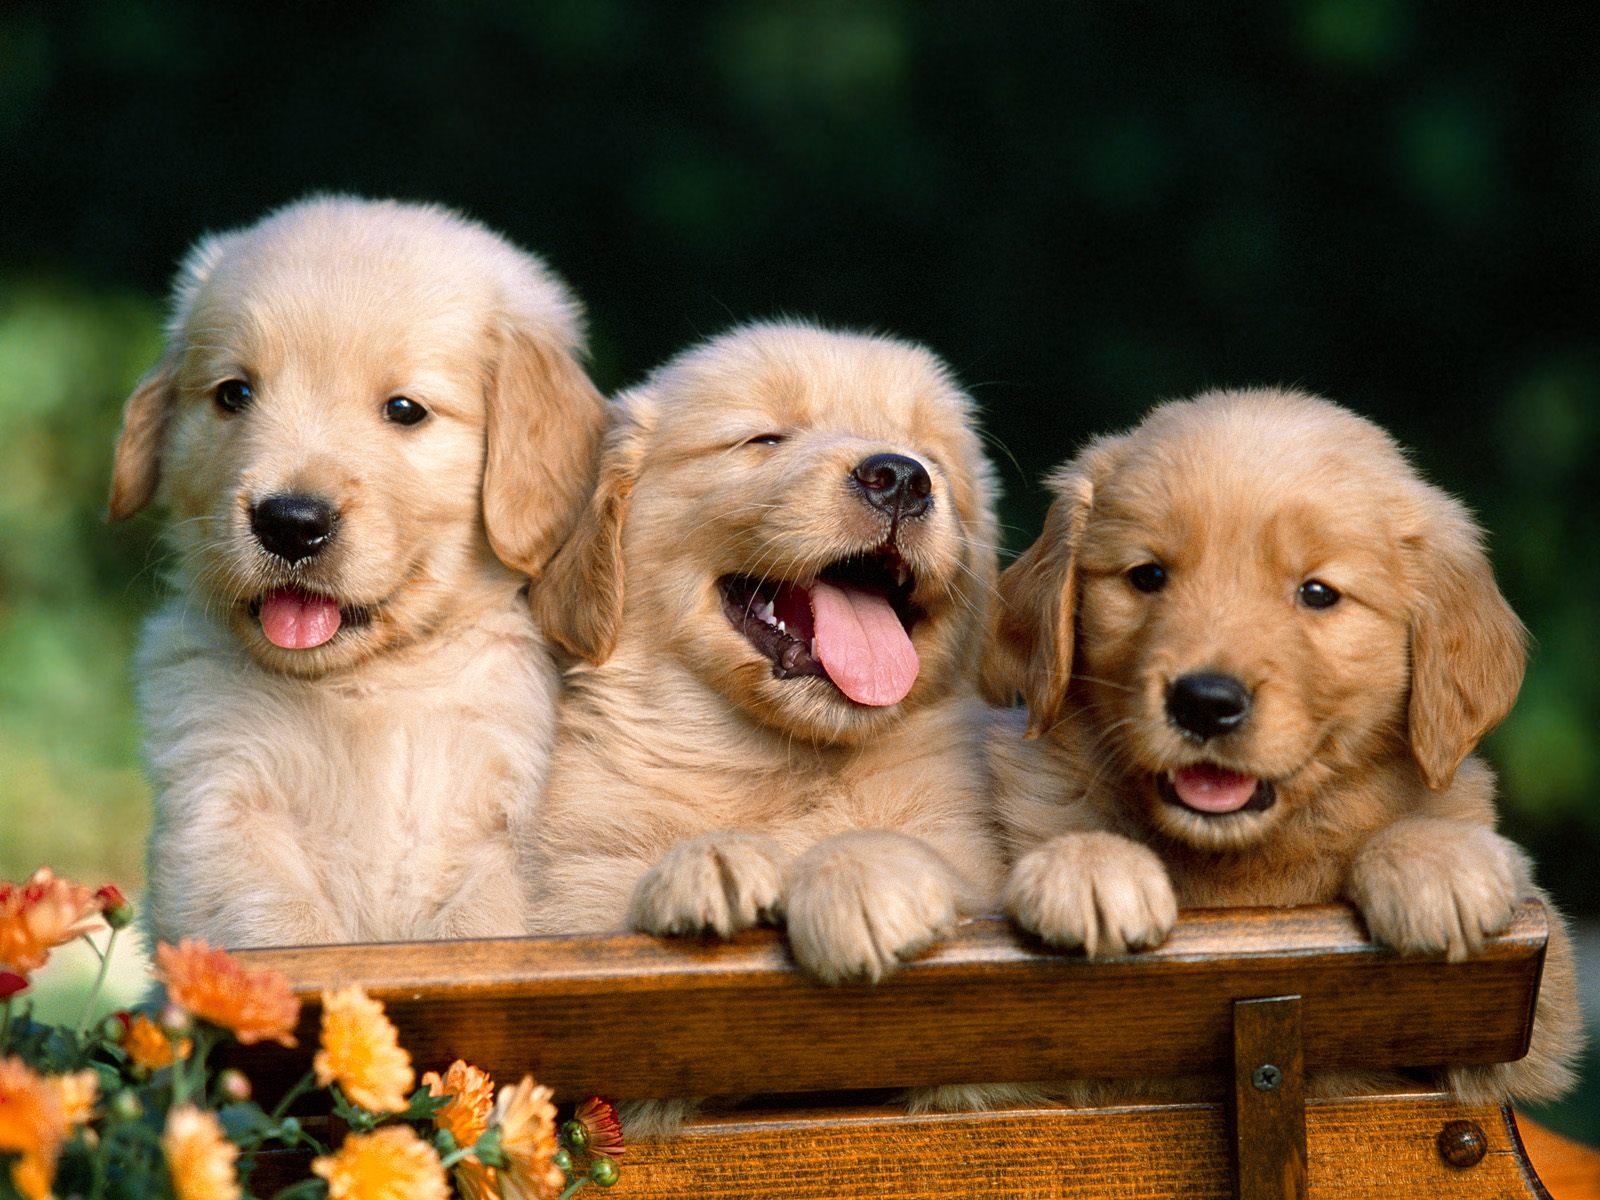 http://1.bp.blogspot.com/-yQuNrb8H7PM/T9GgQDzBg7I/AAAAAAAAB9o/gLi-TEokWx0/s1600/Golden+Retriever+Puppies.jpg